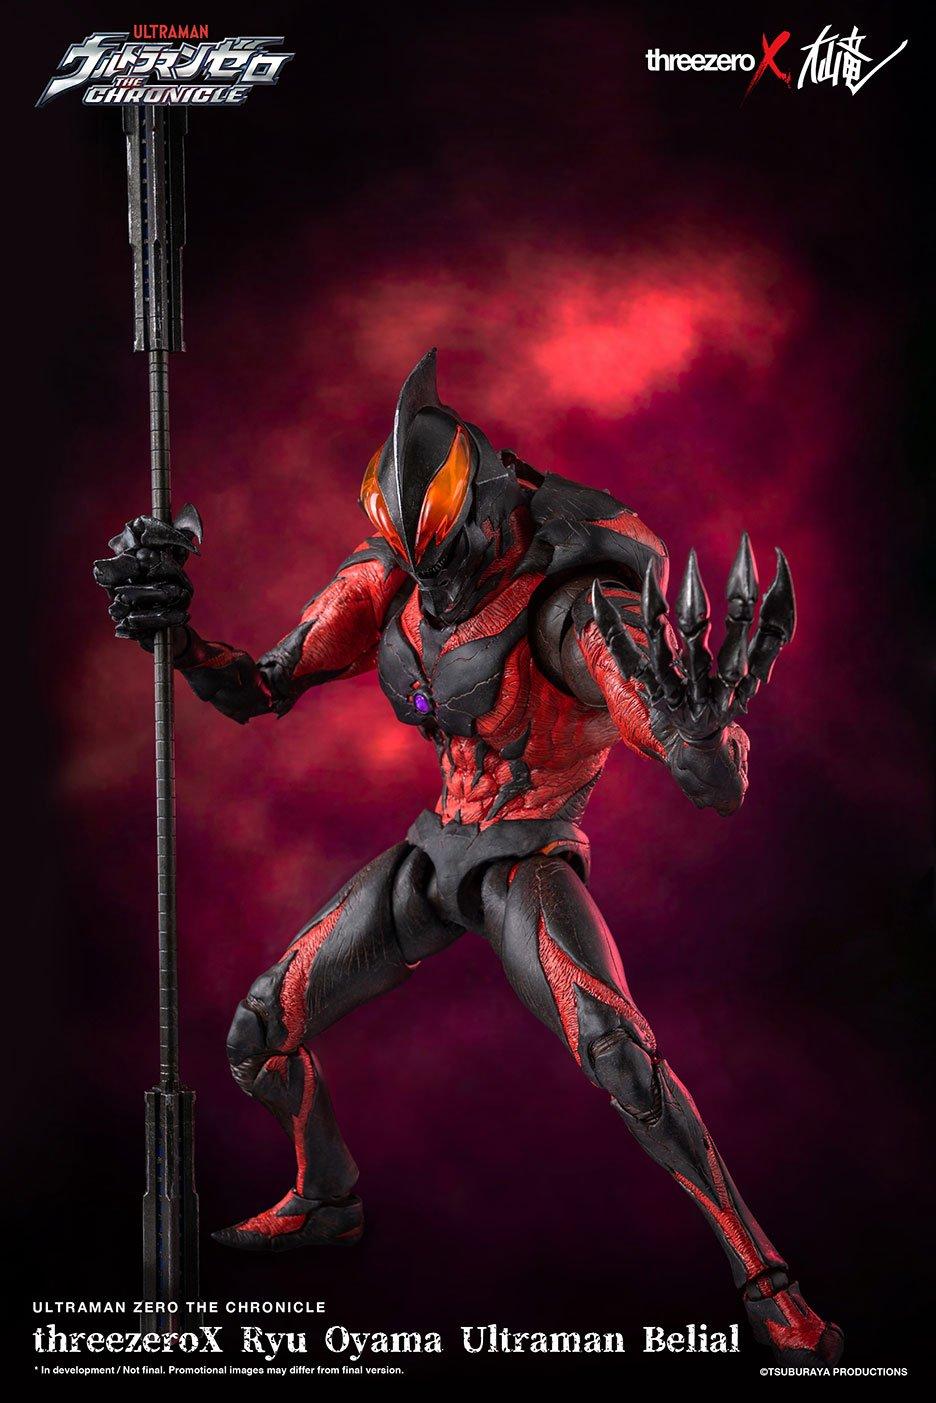 threezeroX-Ryu-Oyama-Ultraman-Belial_withlogo_10.jpg